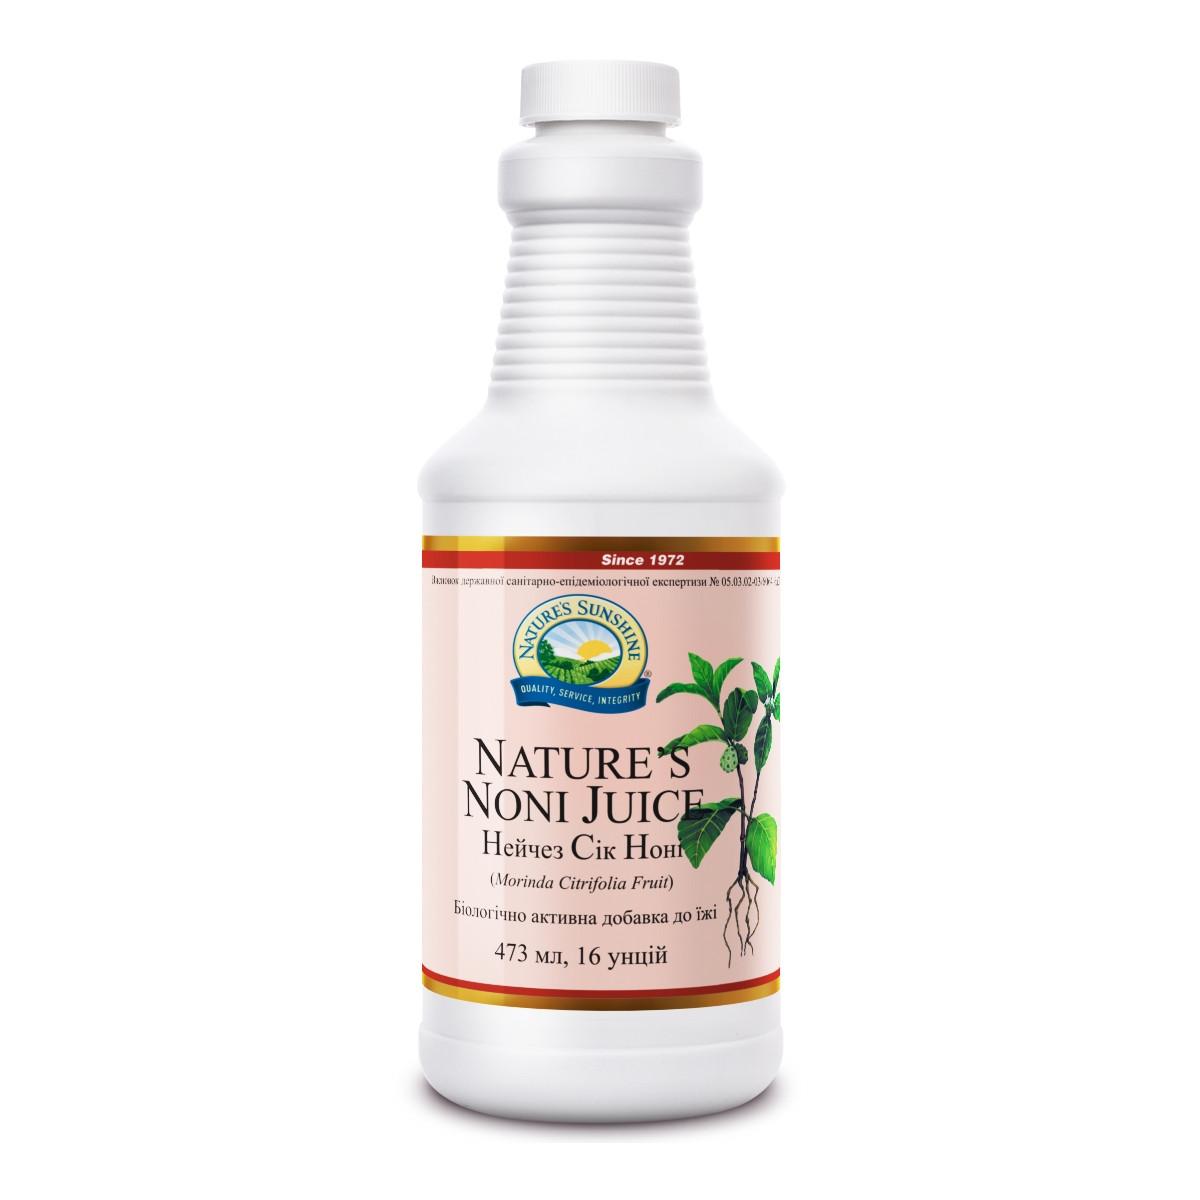 Сік Ноні Нэйчез nature's Noni Juice, NSP, США